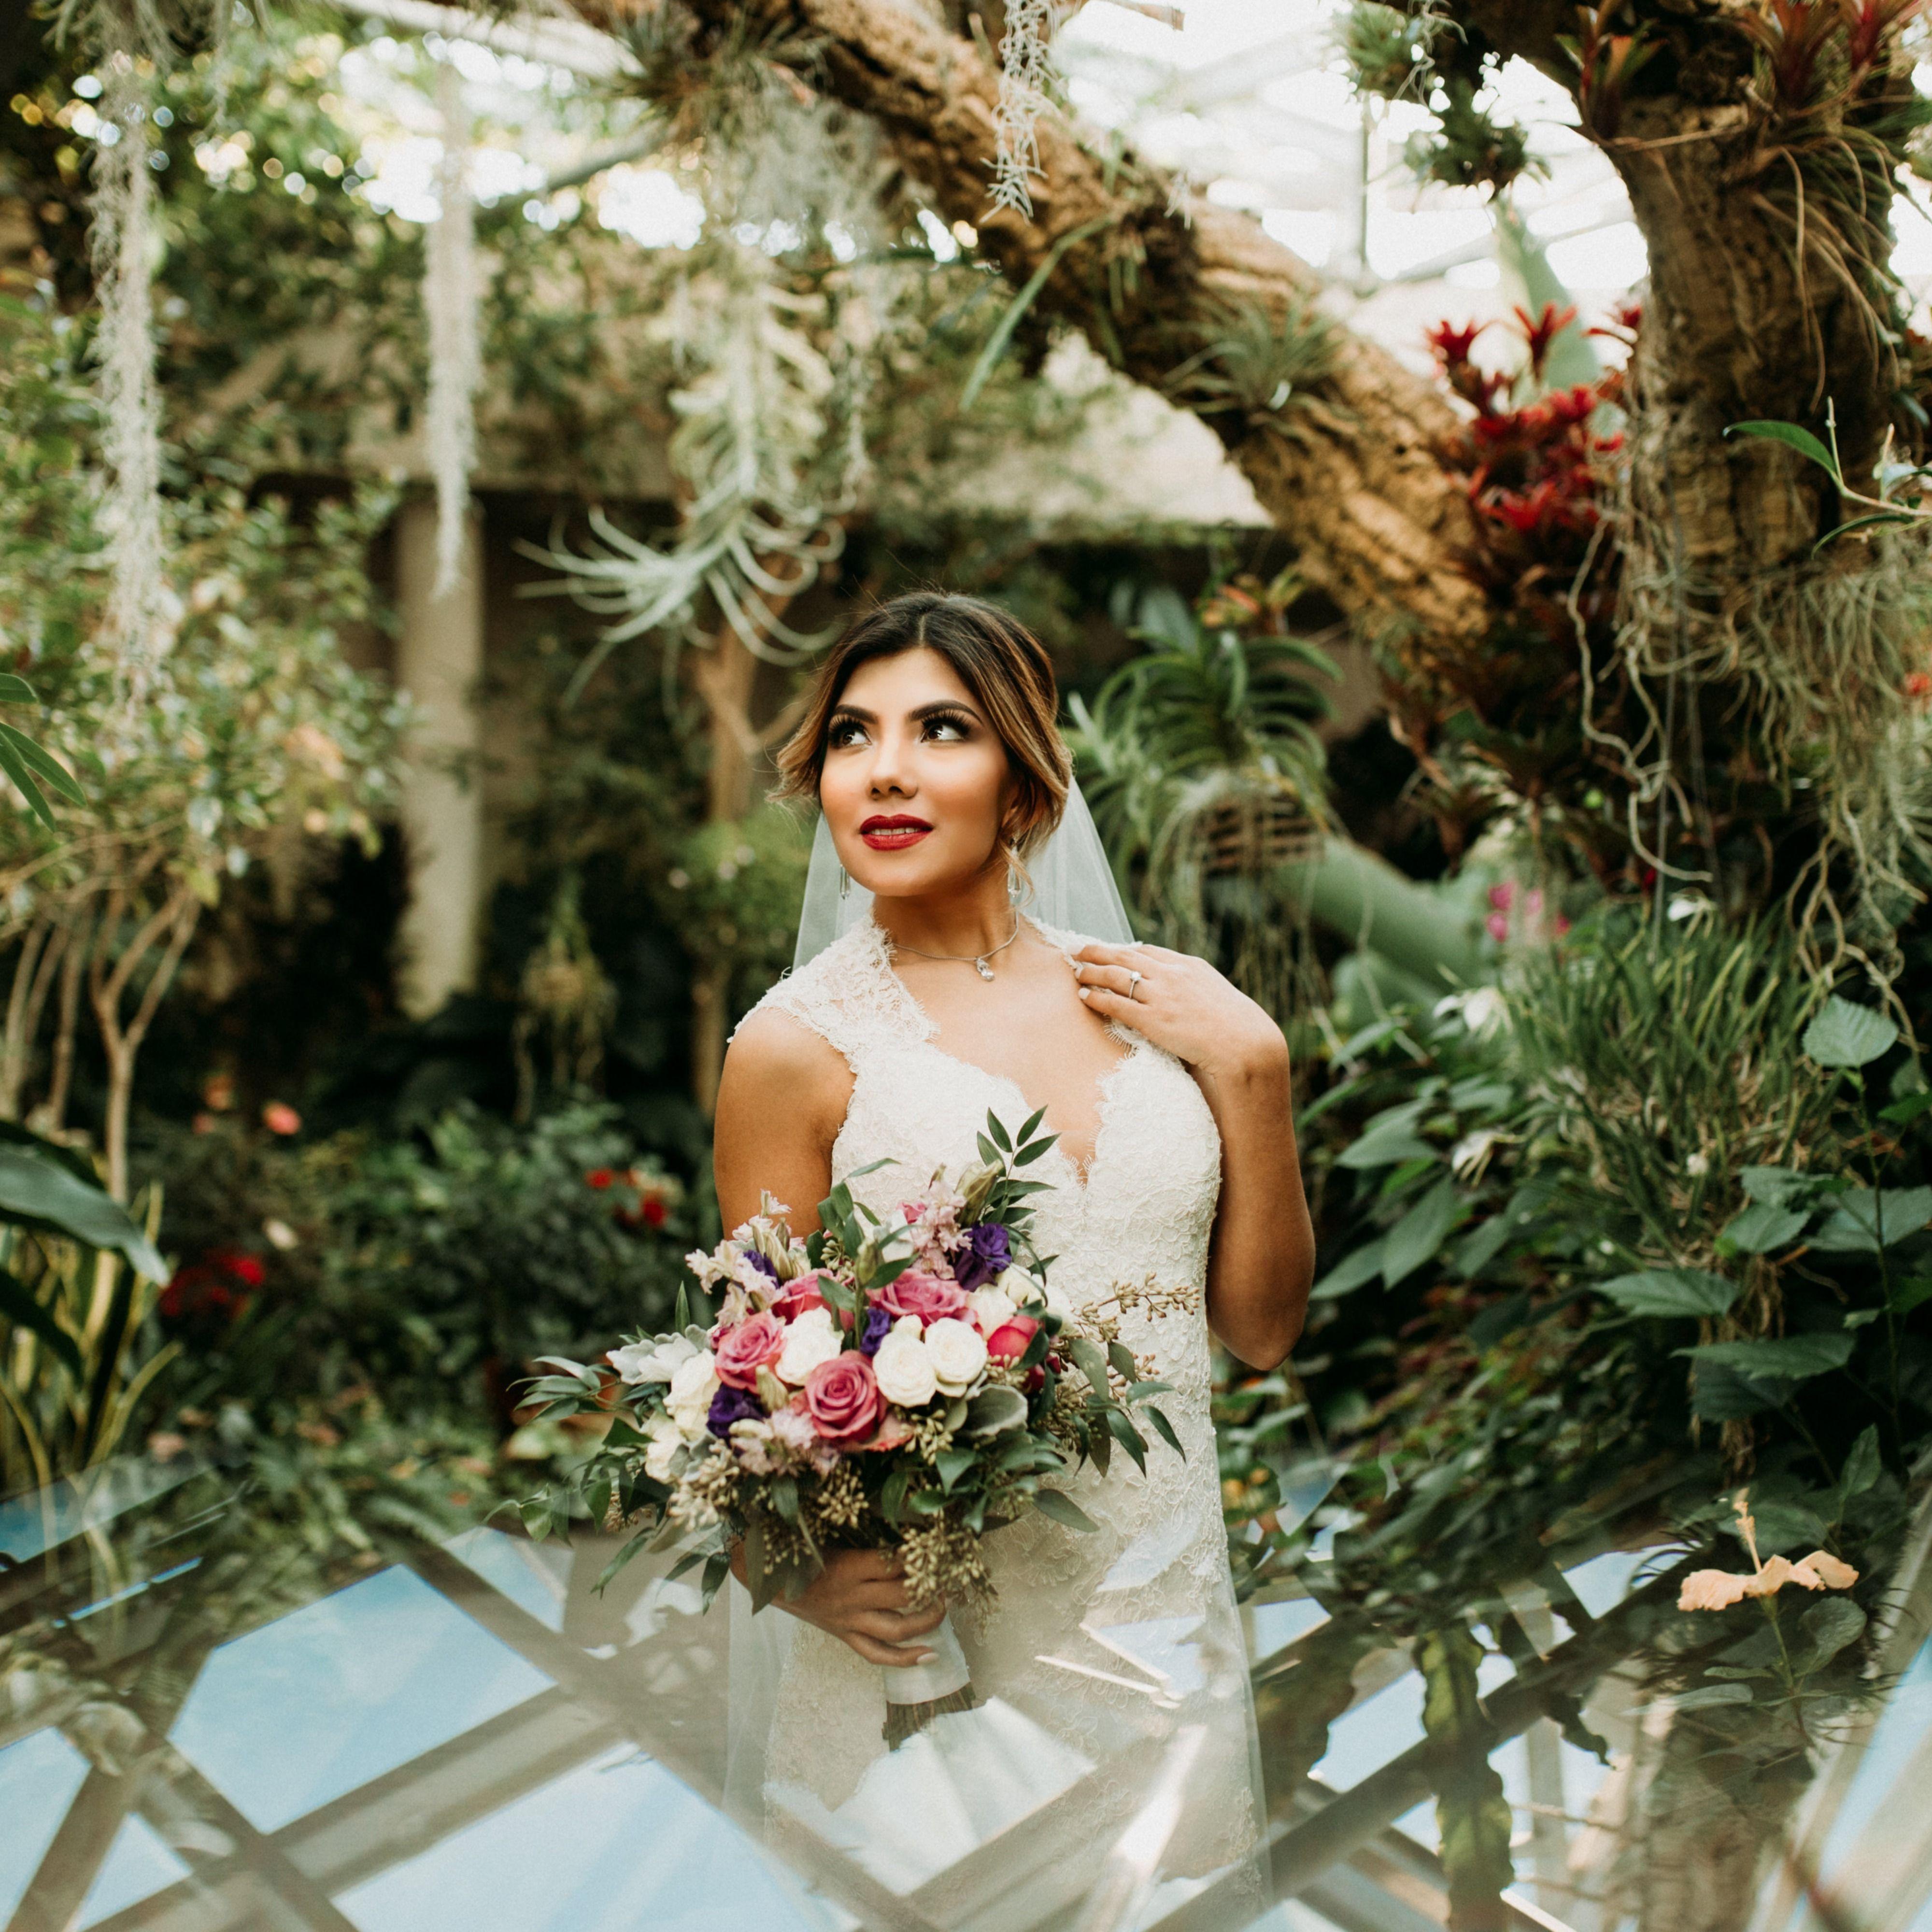 3f290c5aef8e29745284cae352325d11 - San Antonio Botanical Gardens Wedding Price